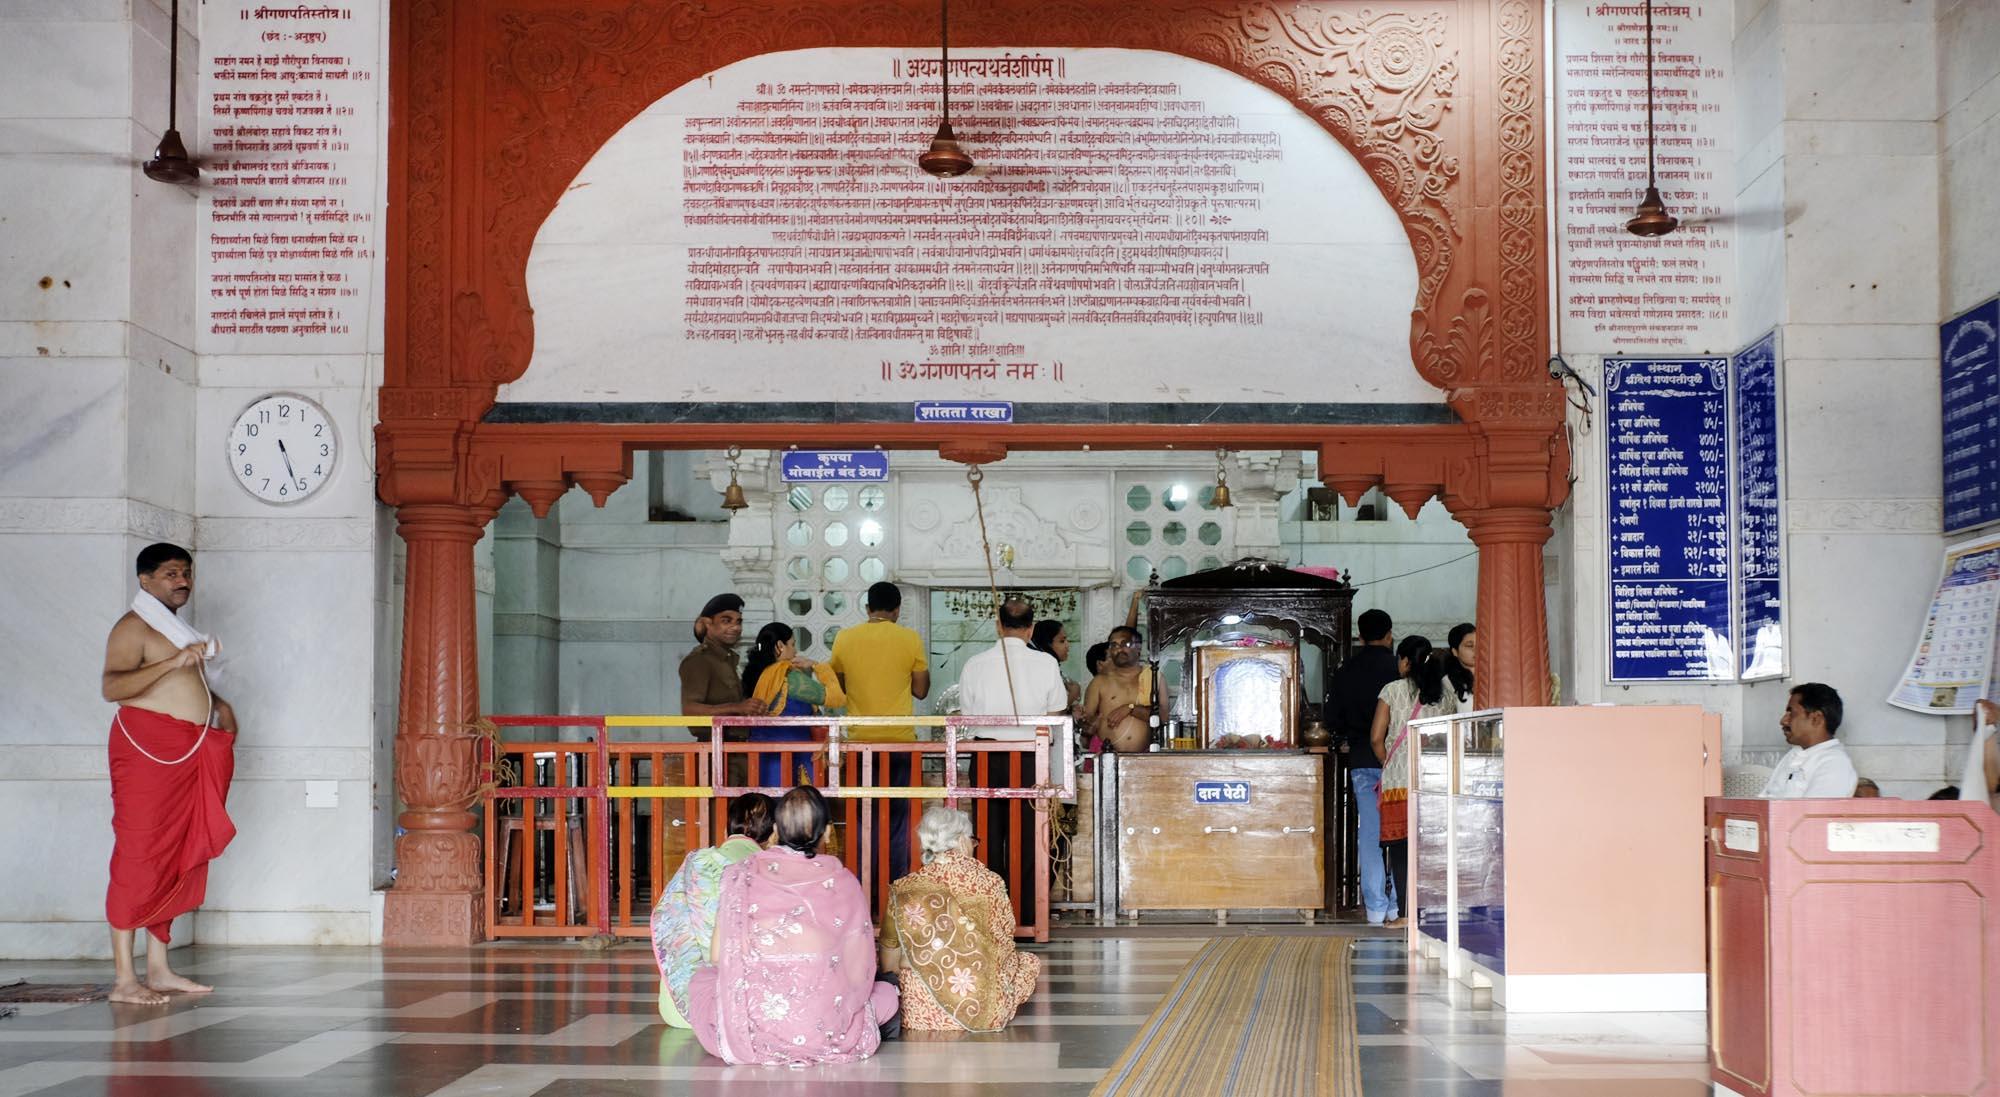 reise-ansichten Tempel Ganipatipule